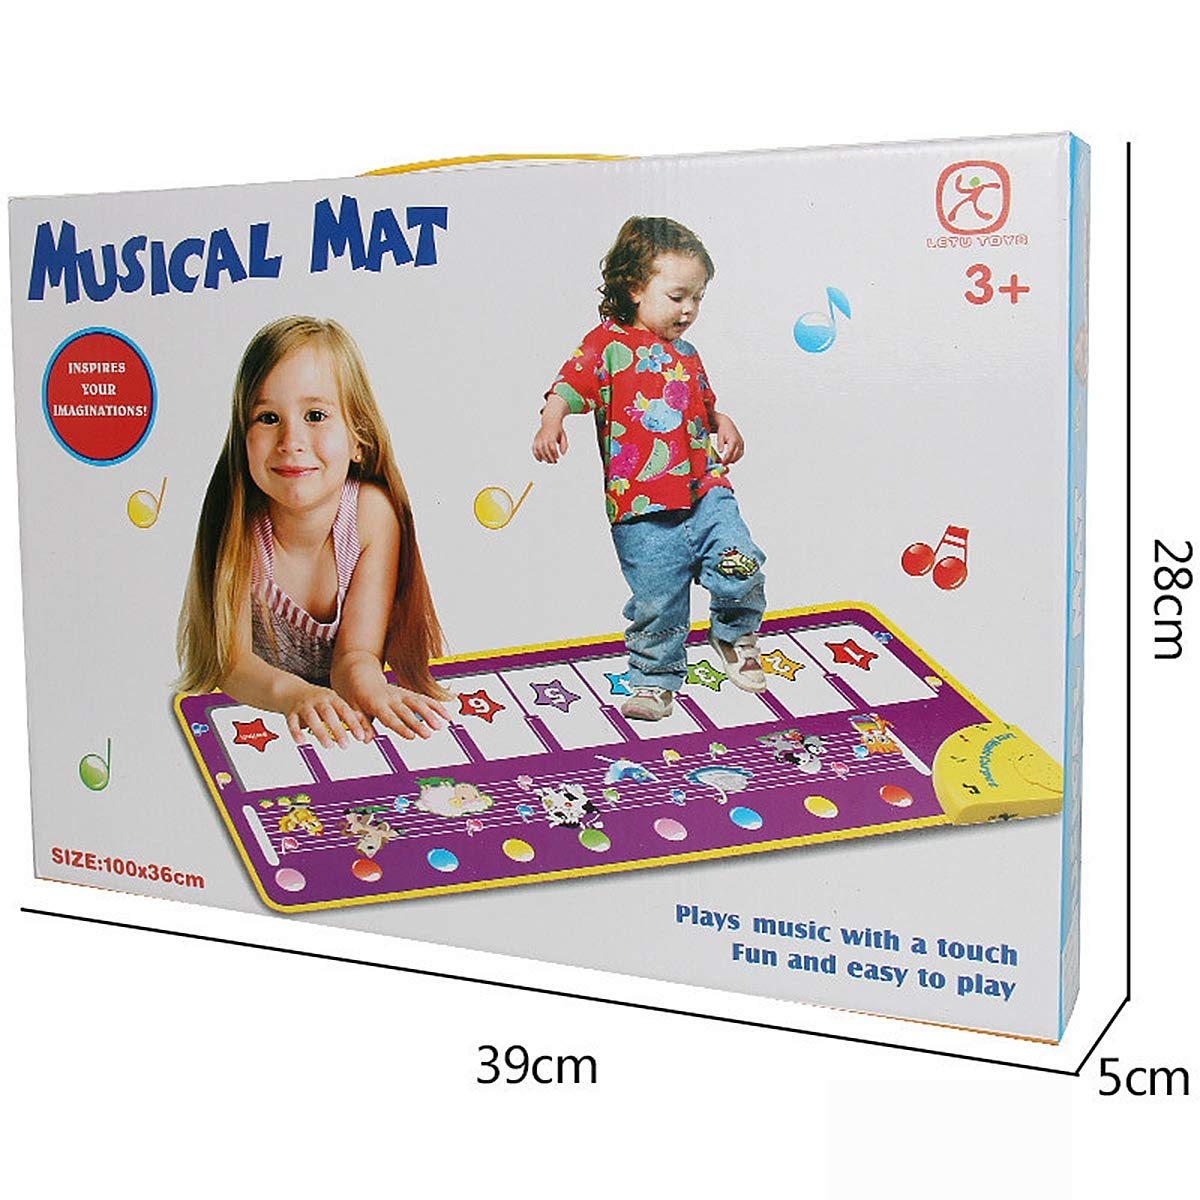 Children's Electronic Piano Mat, Electronic Music Playmat Piano Mat Cartoon Animal Fun Crawling Blanket by Eustoma (Image #8)